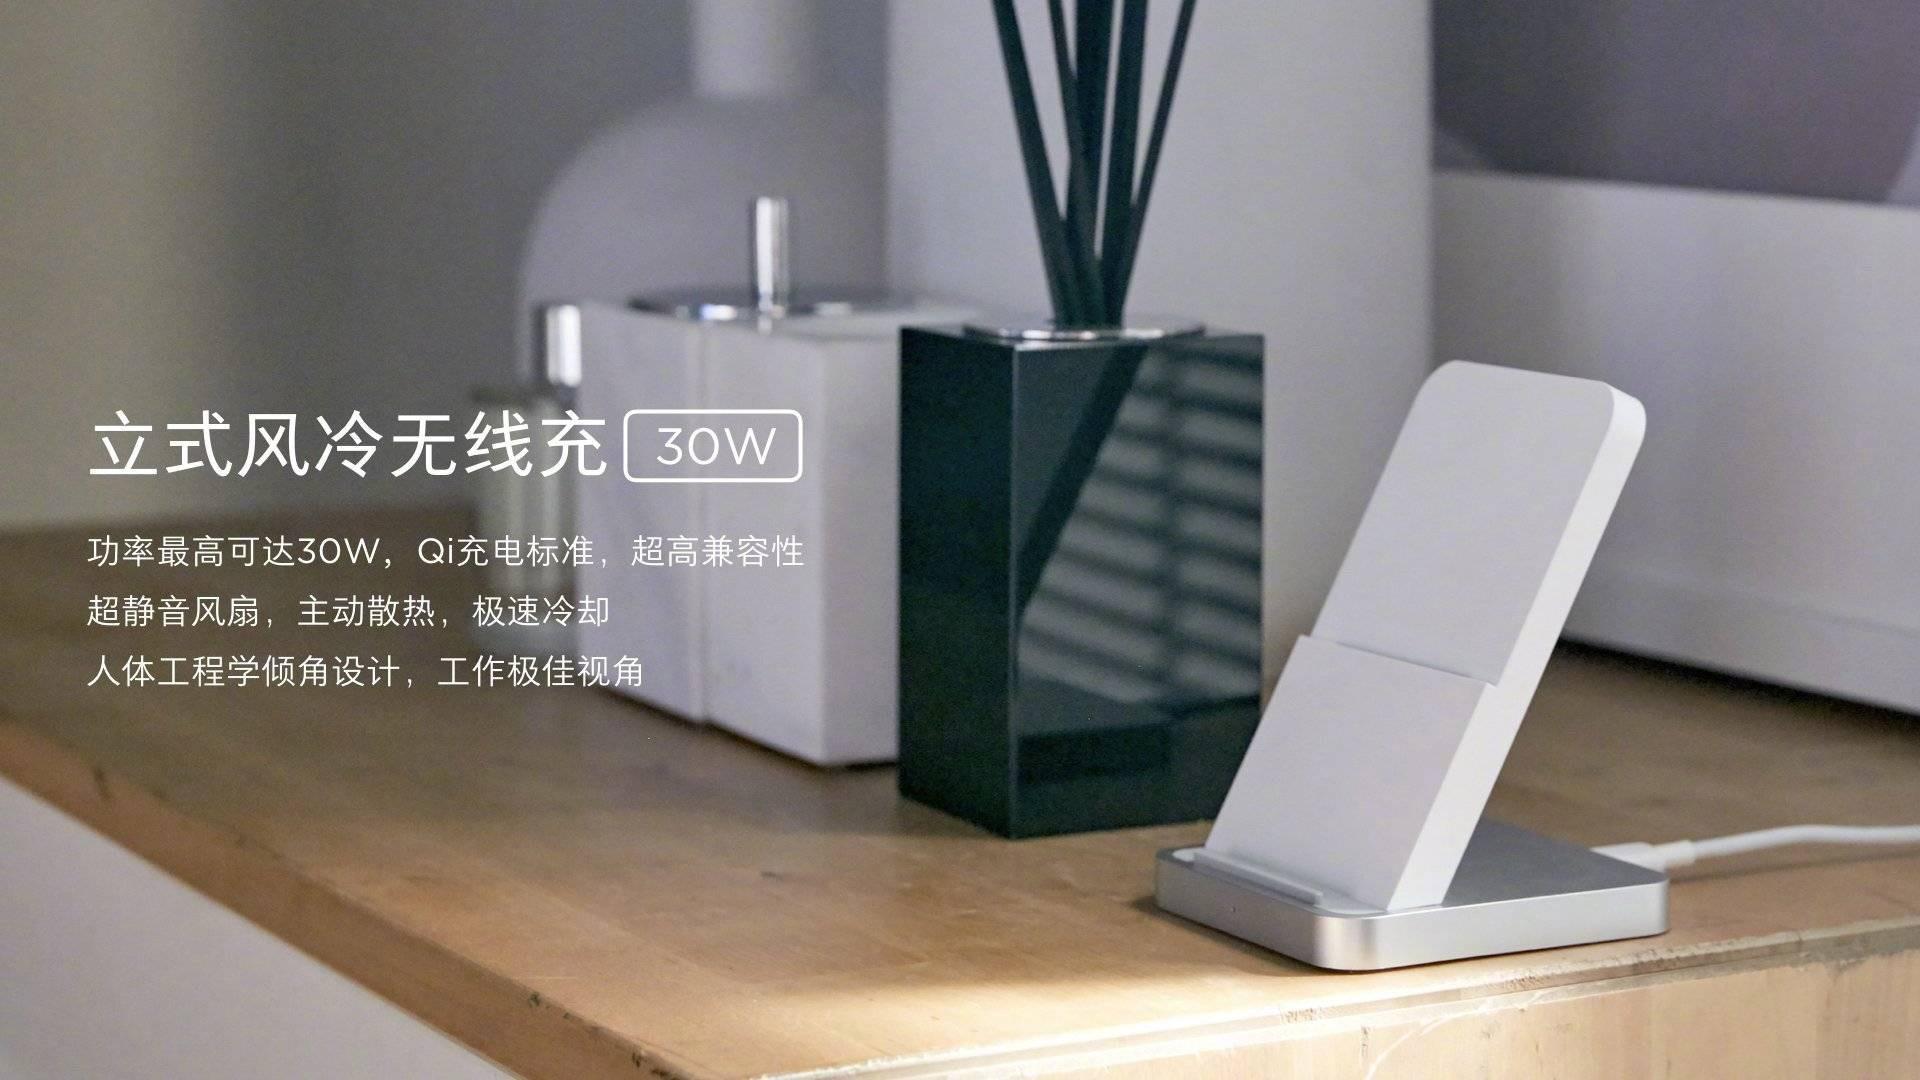 Xiaomi Wireless Ladestation. Xiaomi Addicted News